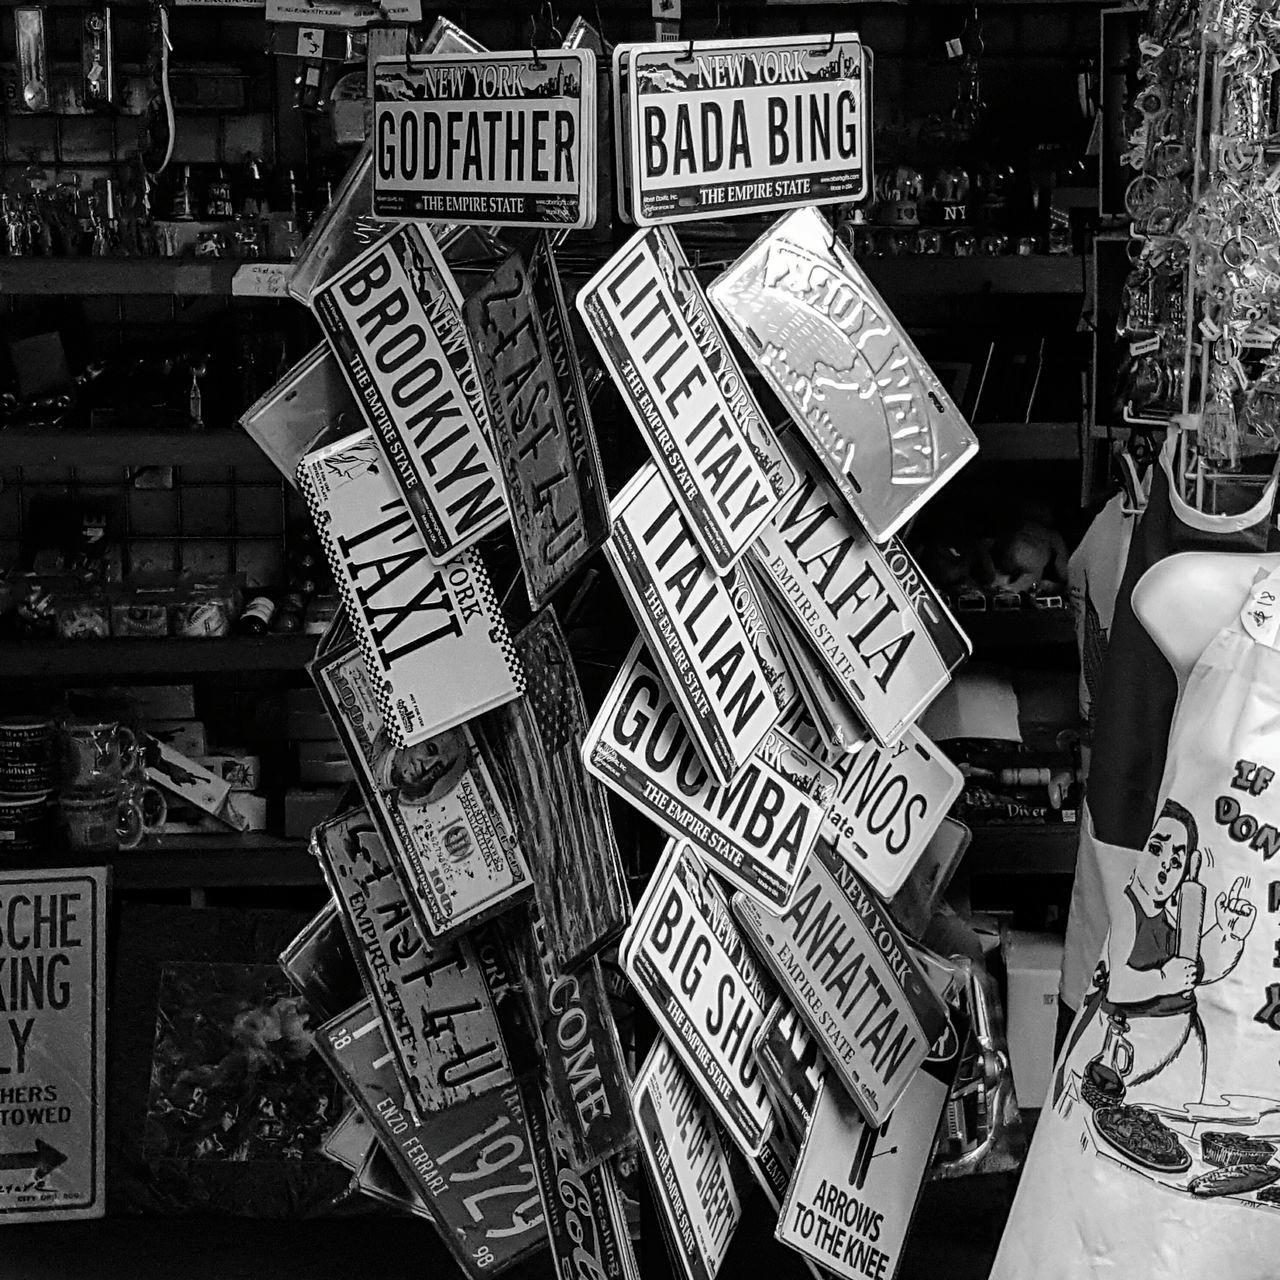 Browsing on Mulberr Street. Store Large Group Of Objects Consumerism NYC Nostalgia Fashion Urban Lifestyle Bnw_captures Black & White Bnw_friday_eyeemchallenge EyeEyem Mobile Photography Shootermag_usa Streetartistry EyeEmBestPics Streetphotography NYC Photography Street Art/Graffiti